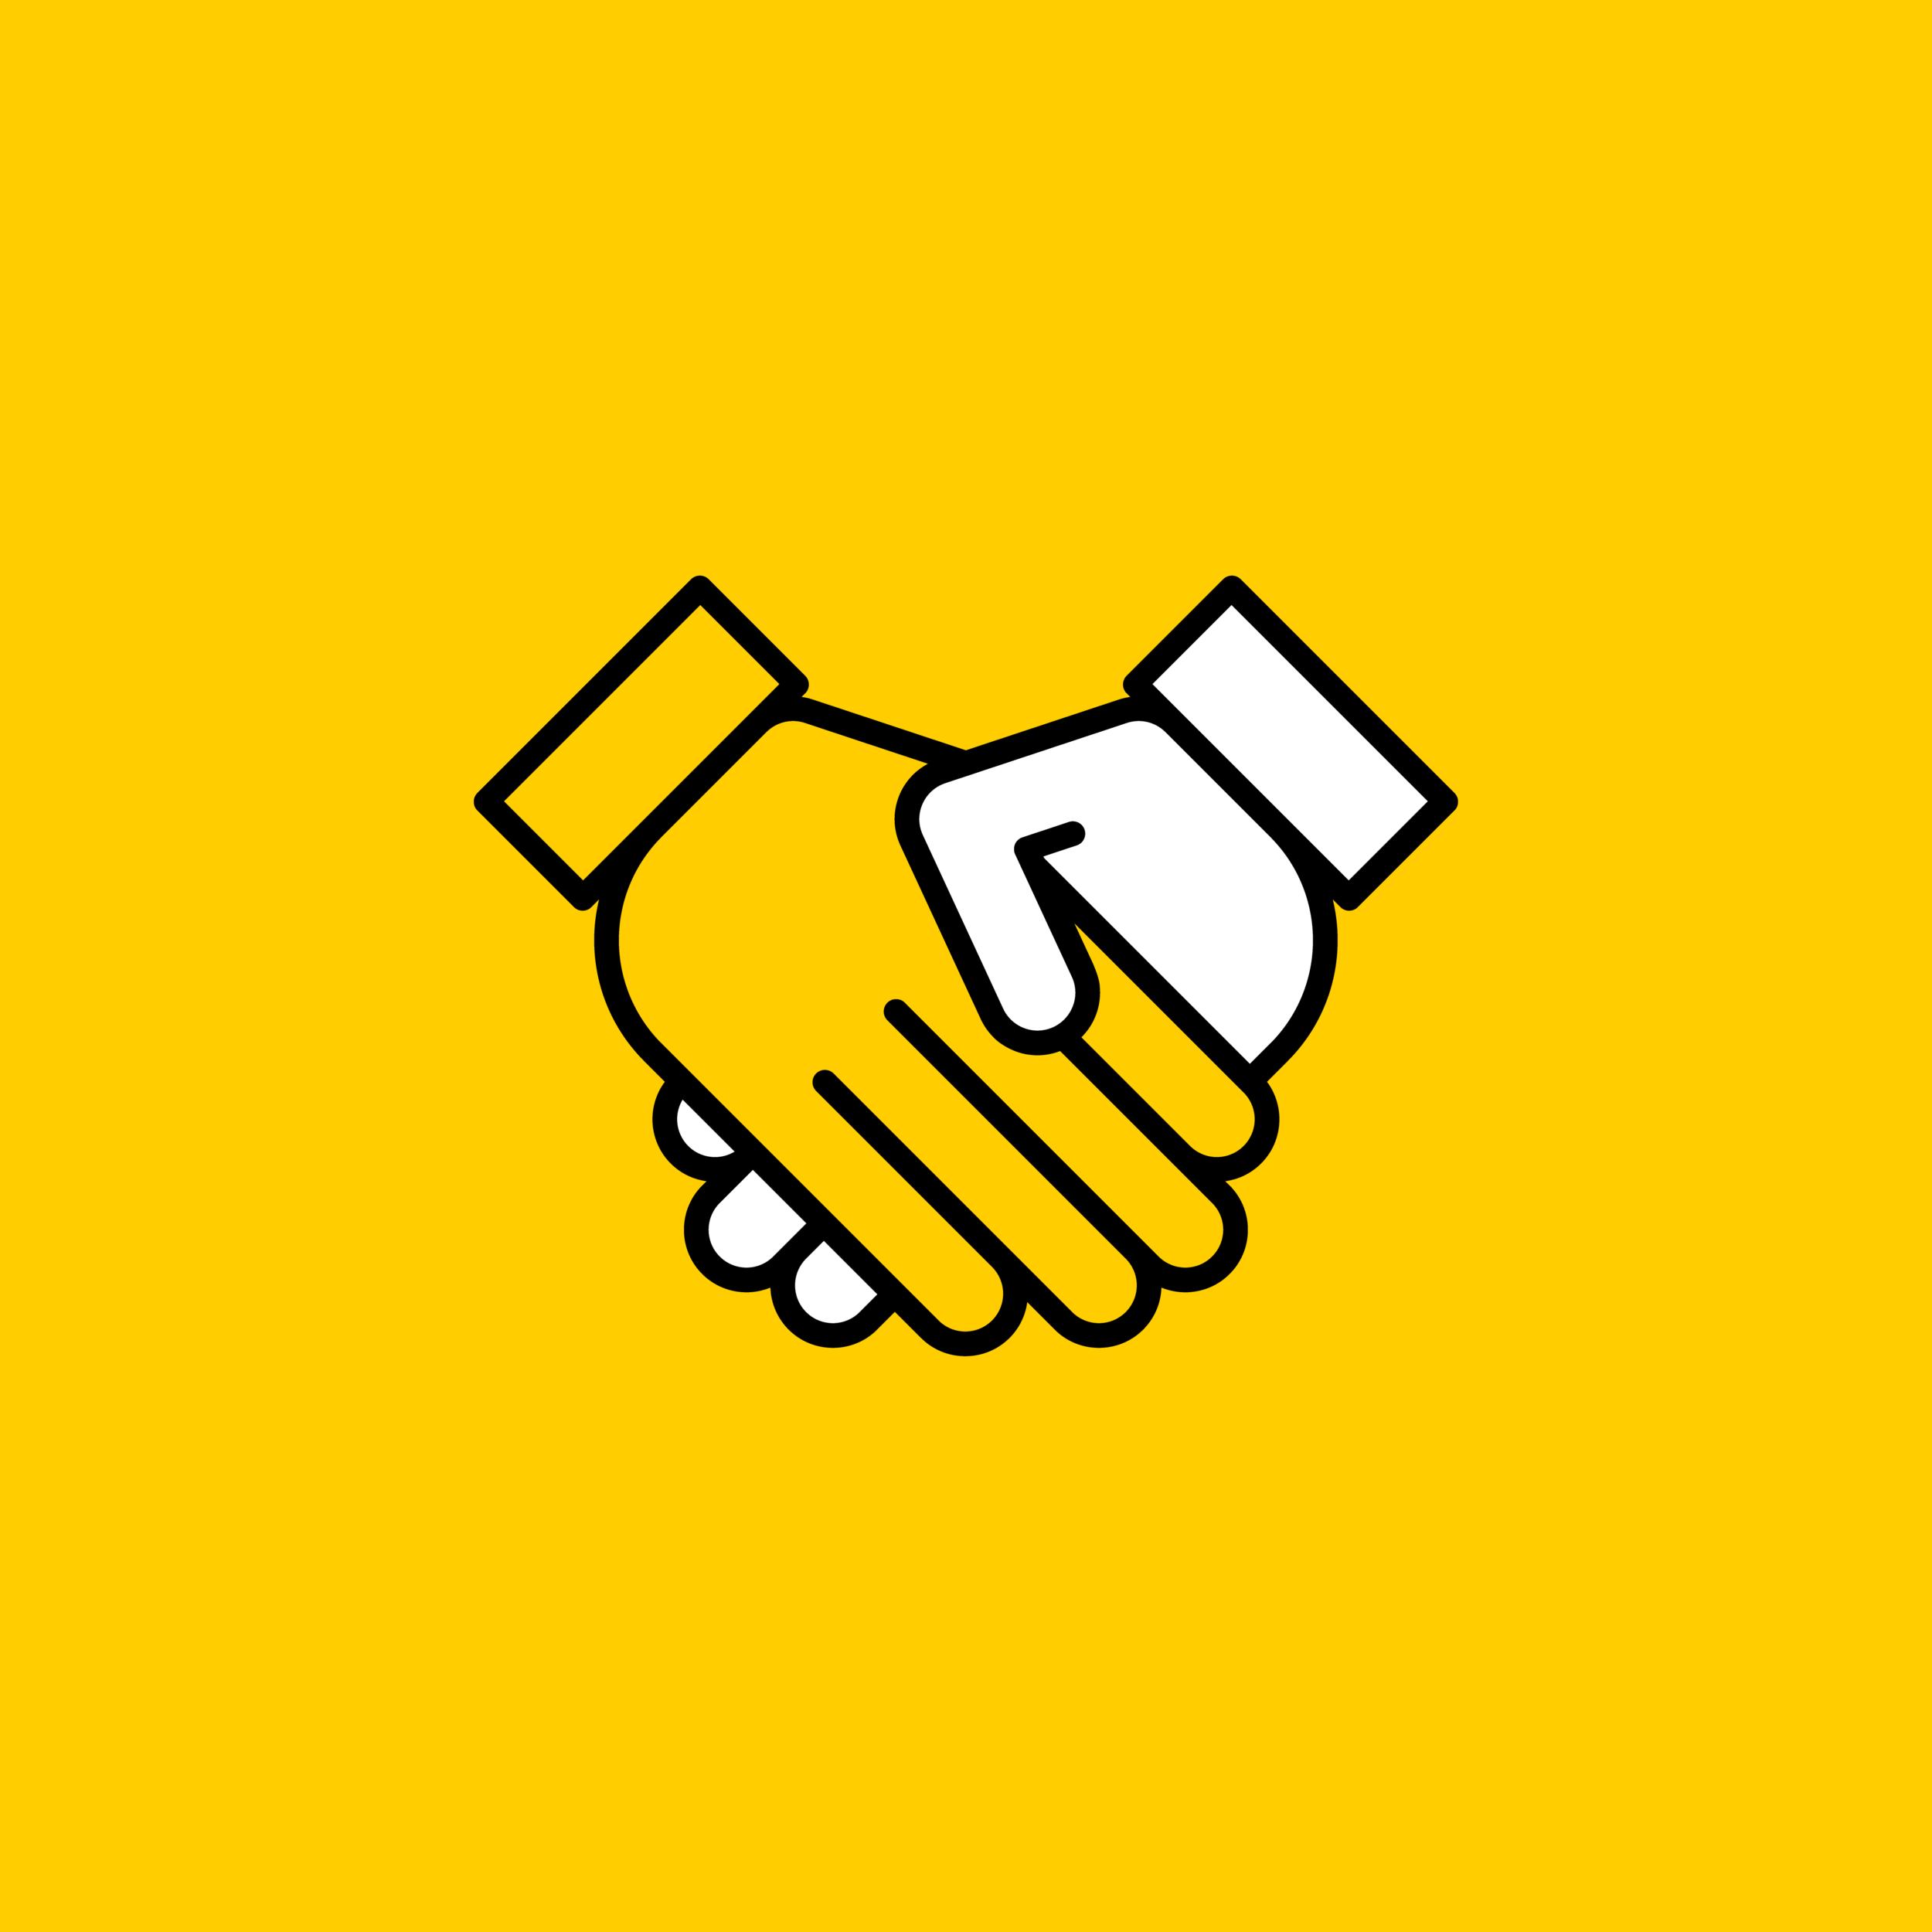 Handshake_RGB_Digital (1).png